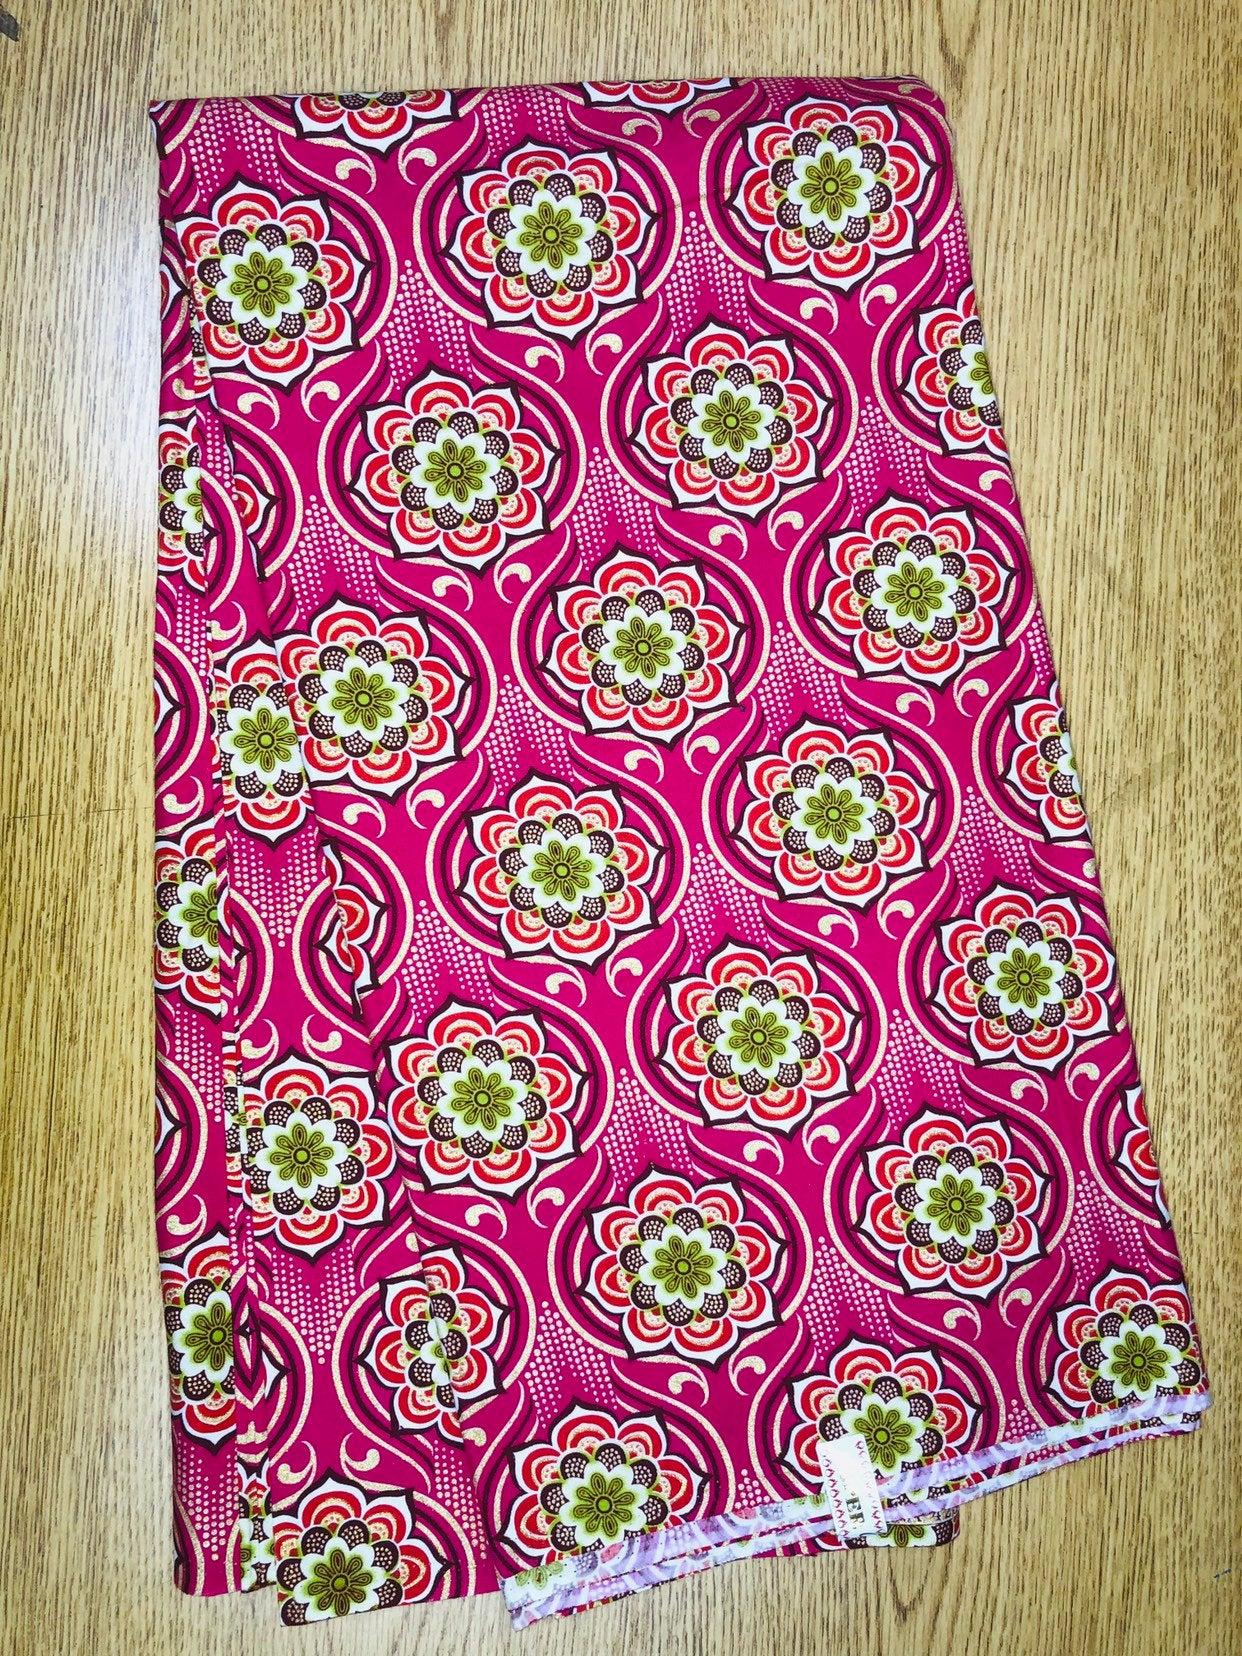 Per Yard Pink Orange Green Gold Flowers Ankara African Print Fabric 1 Yard All Things Ankara Shop